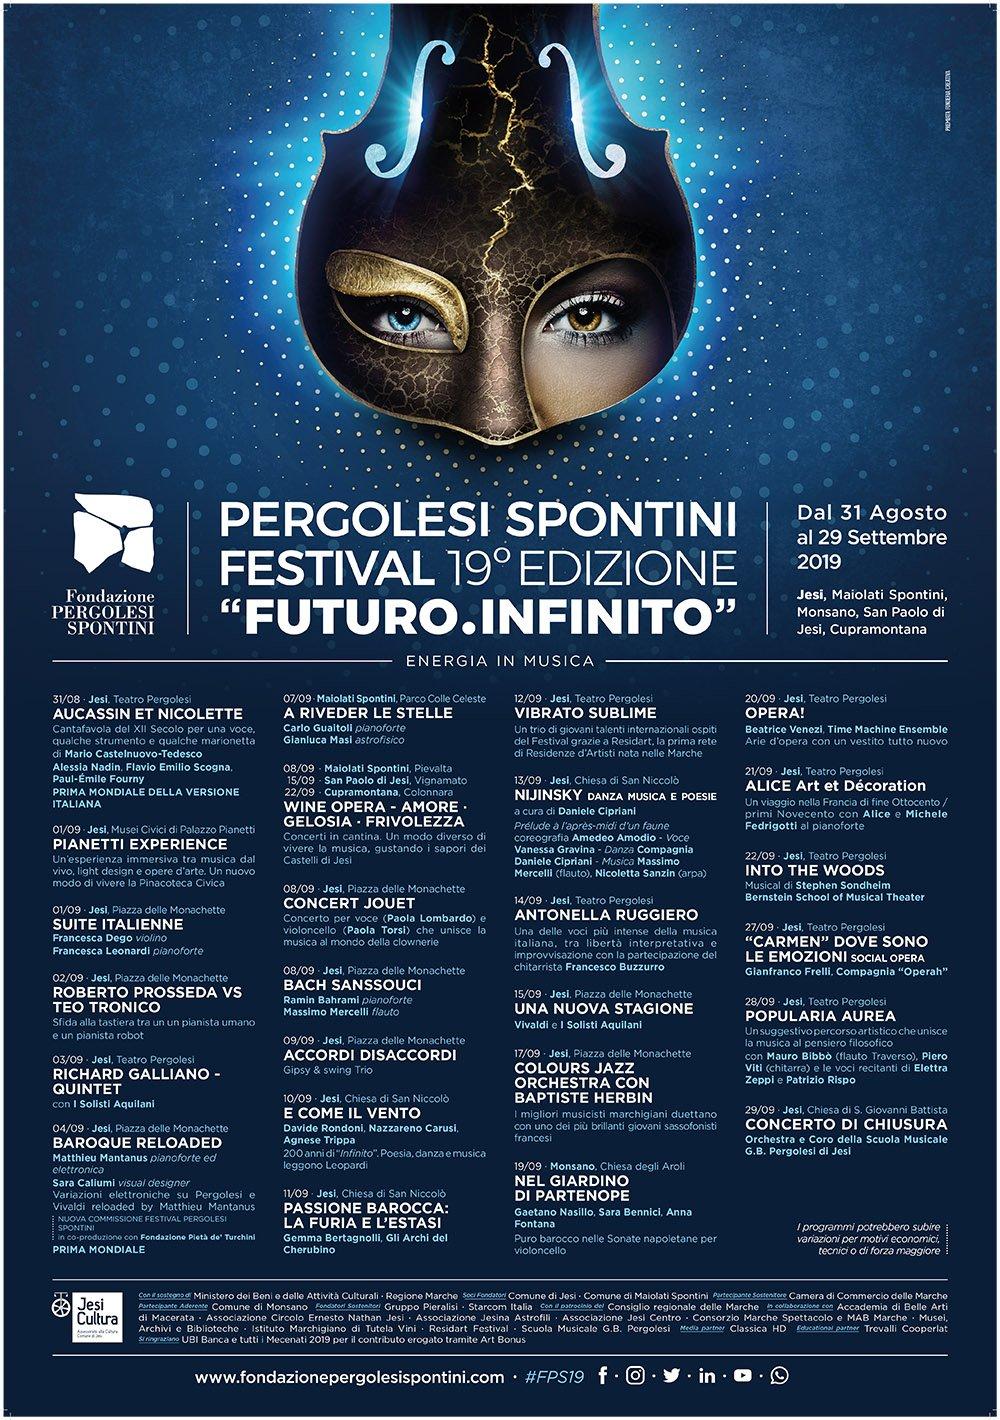 Programma-festival-pergolesi-spontini-2019